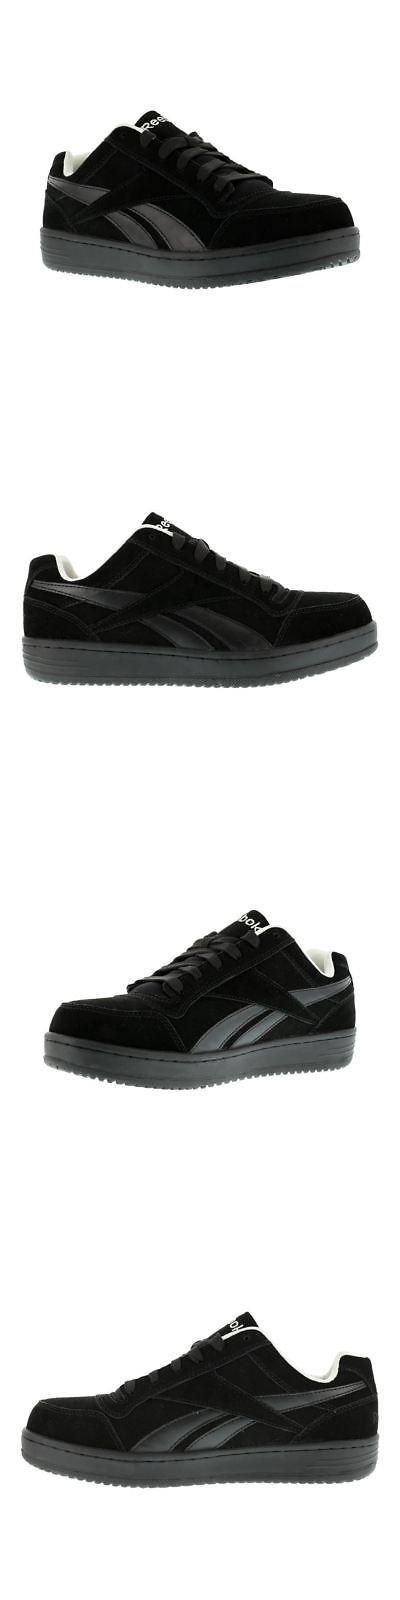 412e2ba2d52894 Occupational 11501  Reebok Rb1910 Soyay Mens Black Steel Toe Classic  Skateboard Oxford Work Shoes -